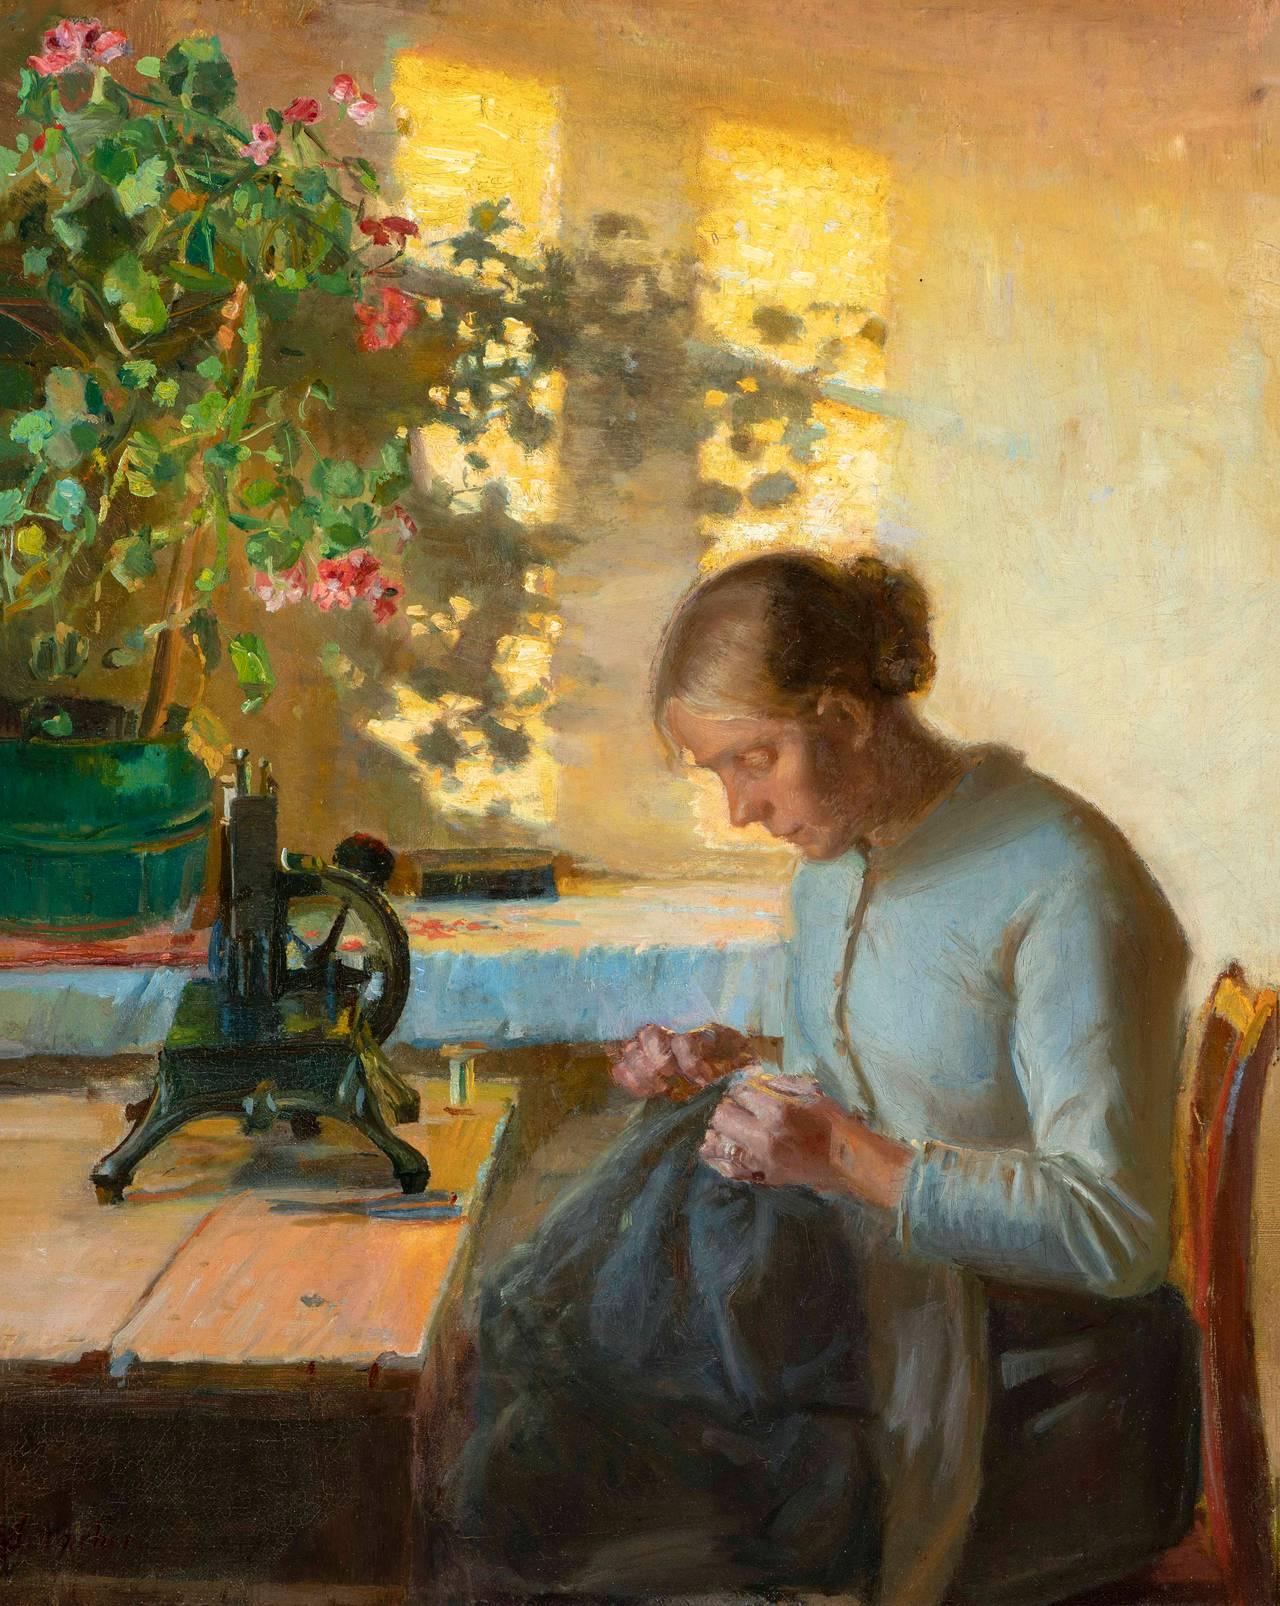 Anna Ancher, Cindy Fiskerbage.  Quasi.  1899. Museo d'arte Randers.